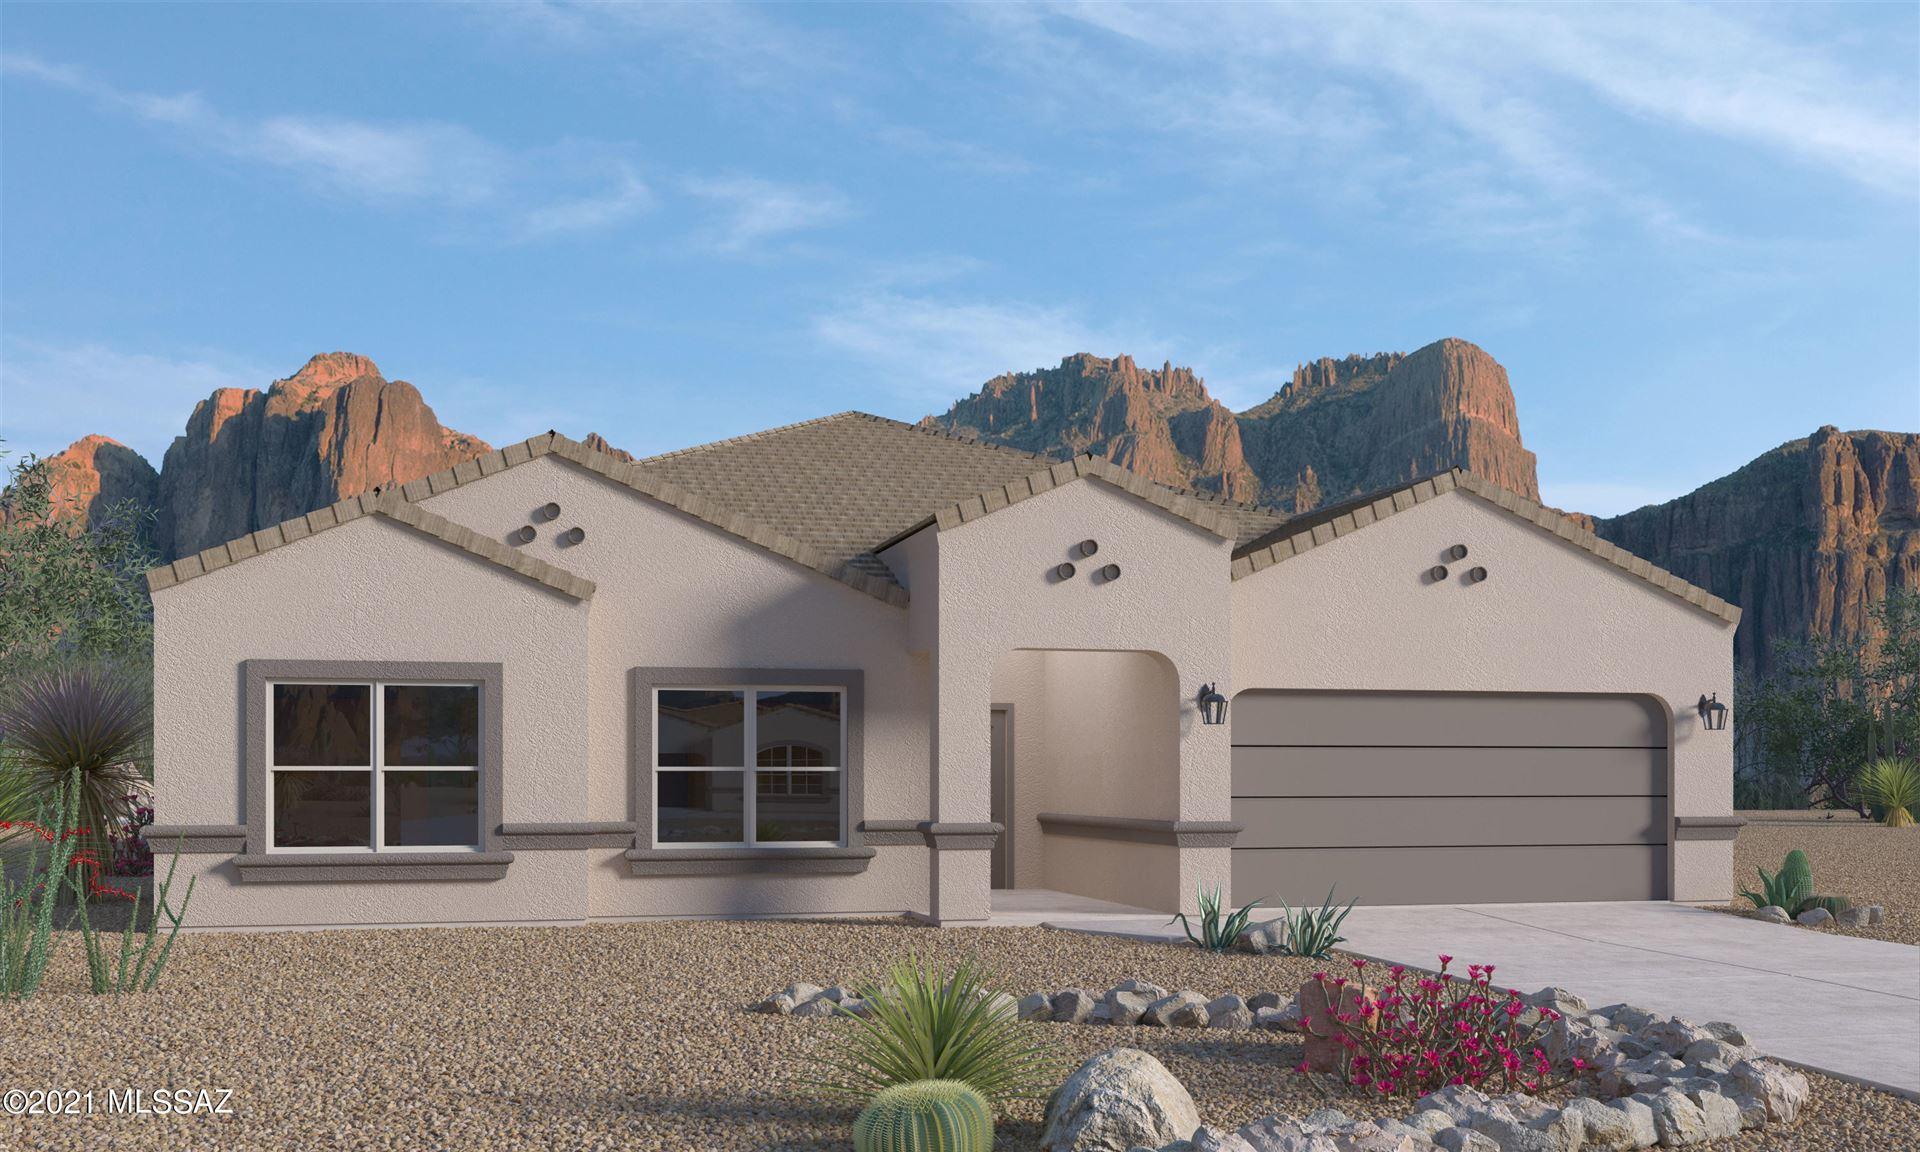 483 W Weldon Street, Vail, AZ 85641 - MLS#: 22124197